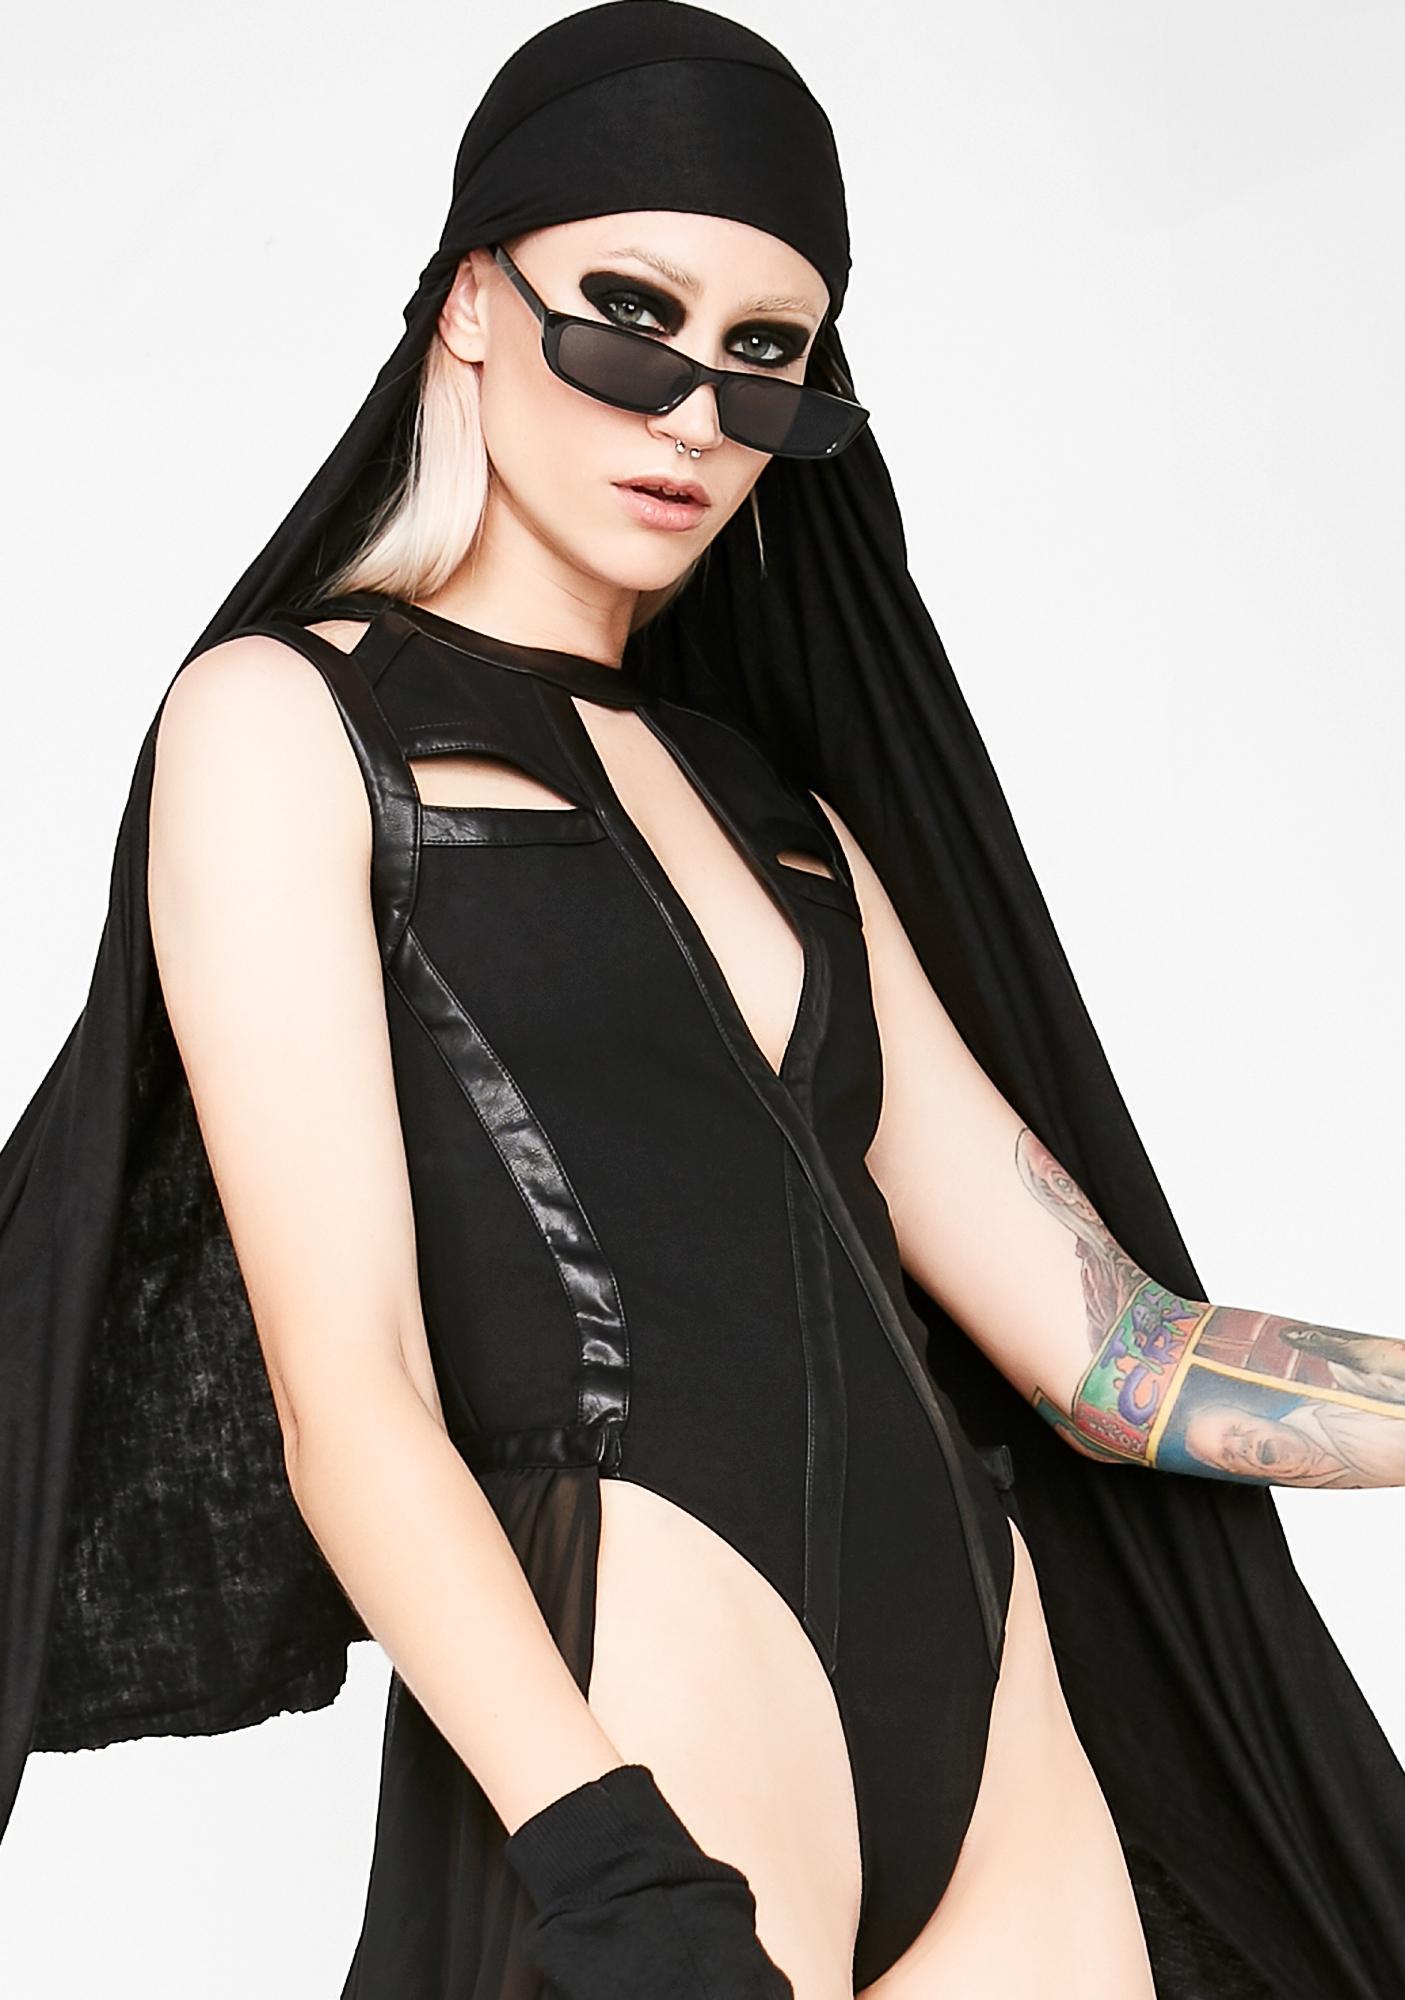 Club Exx Queen Of The Underworld Bodysuit Train Set